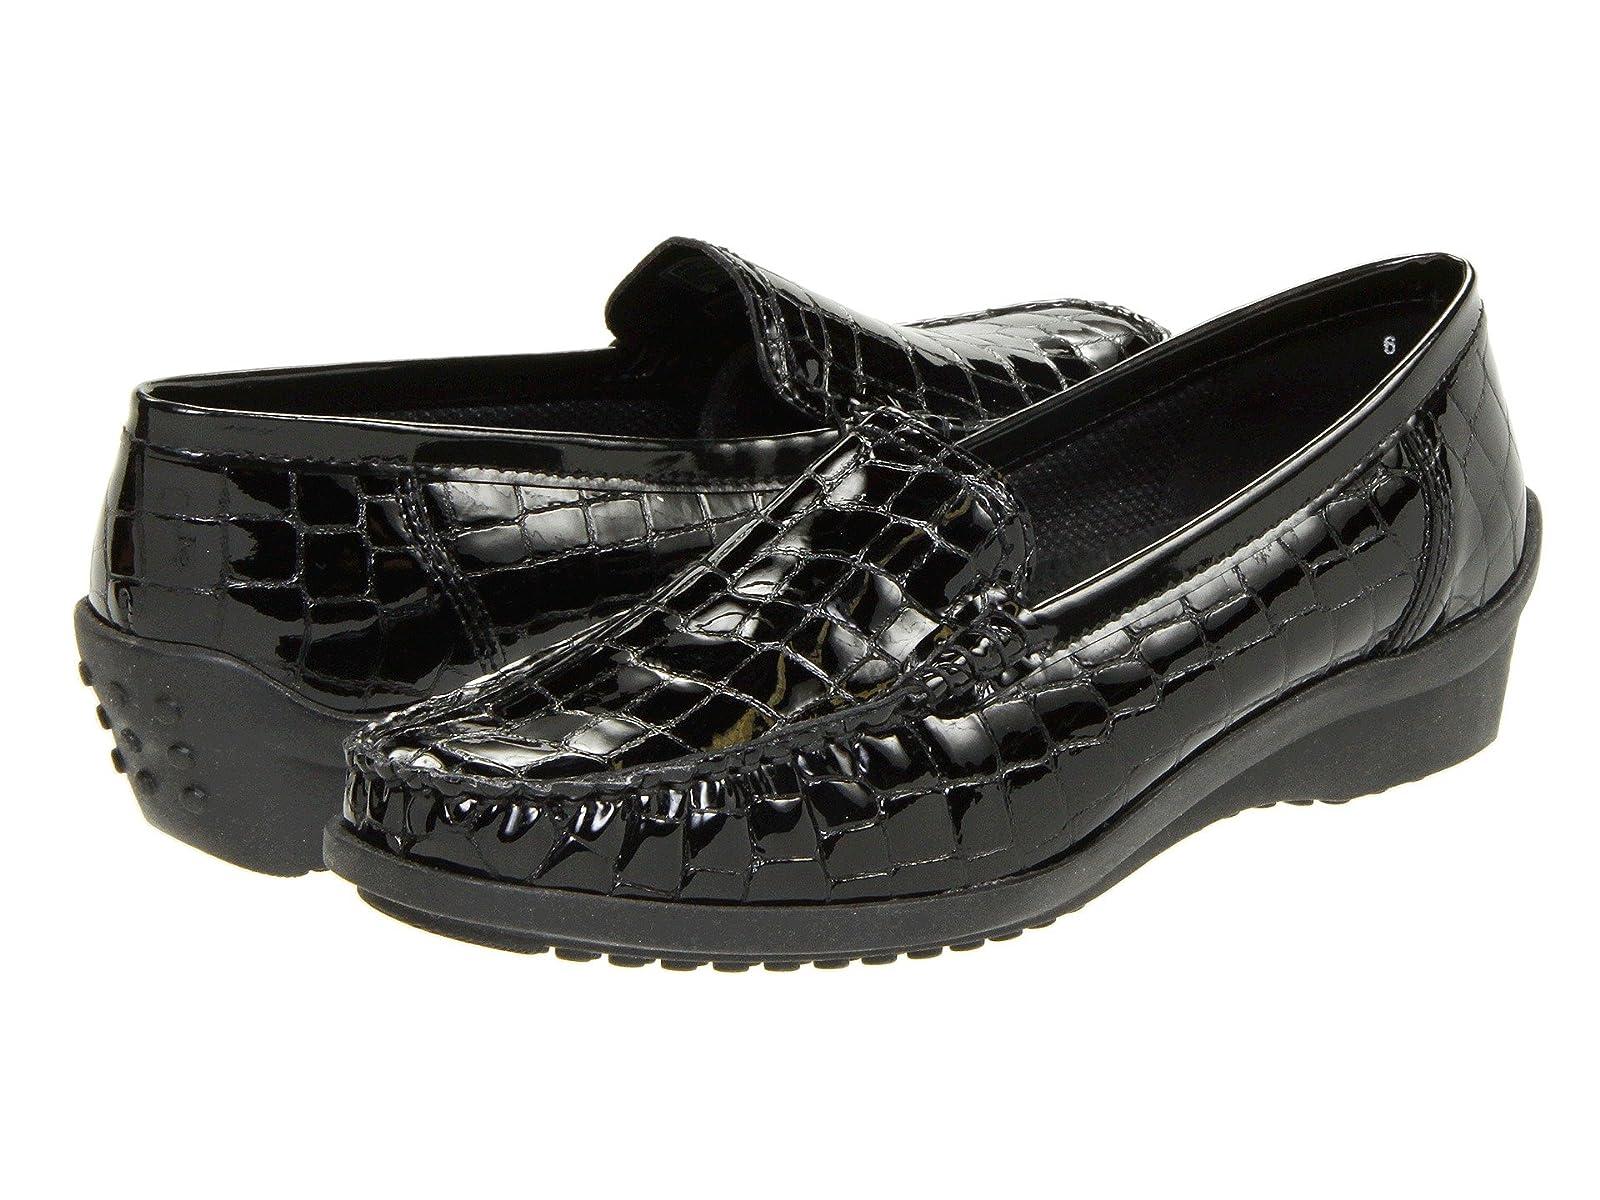 ara PhoebeAtmospheric grades have affordable shoes